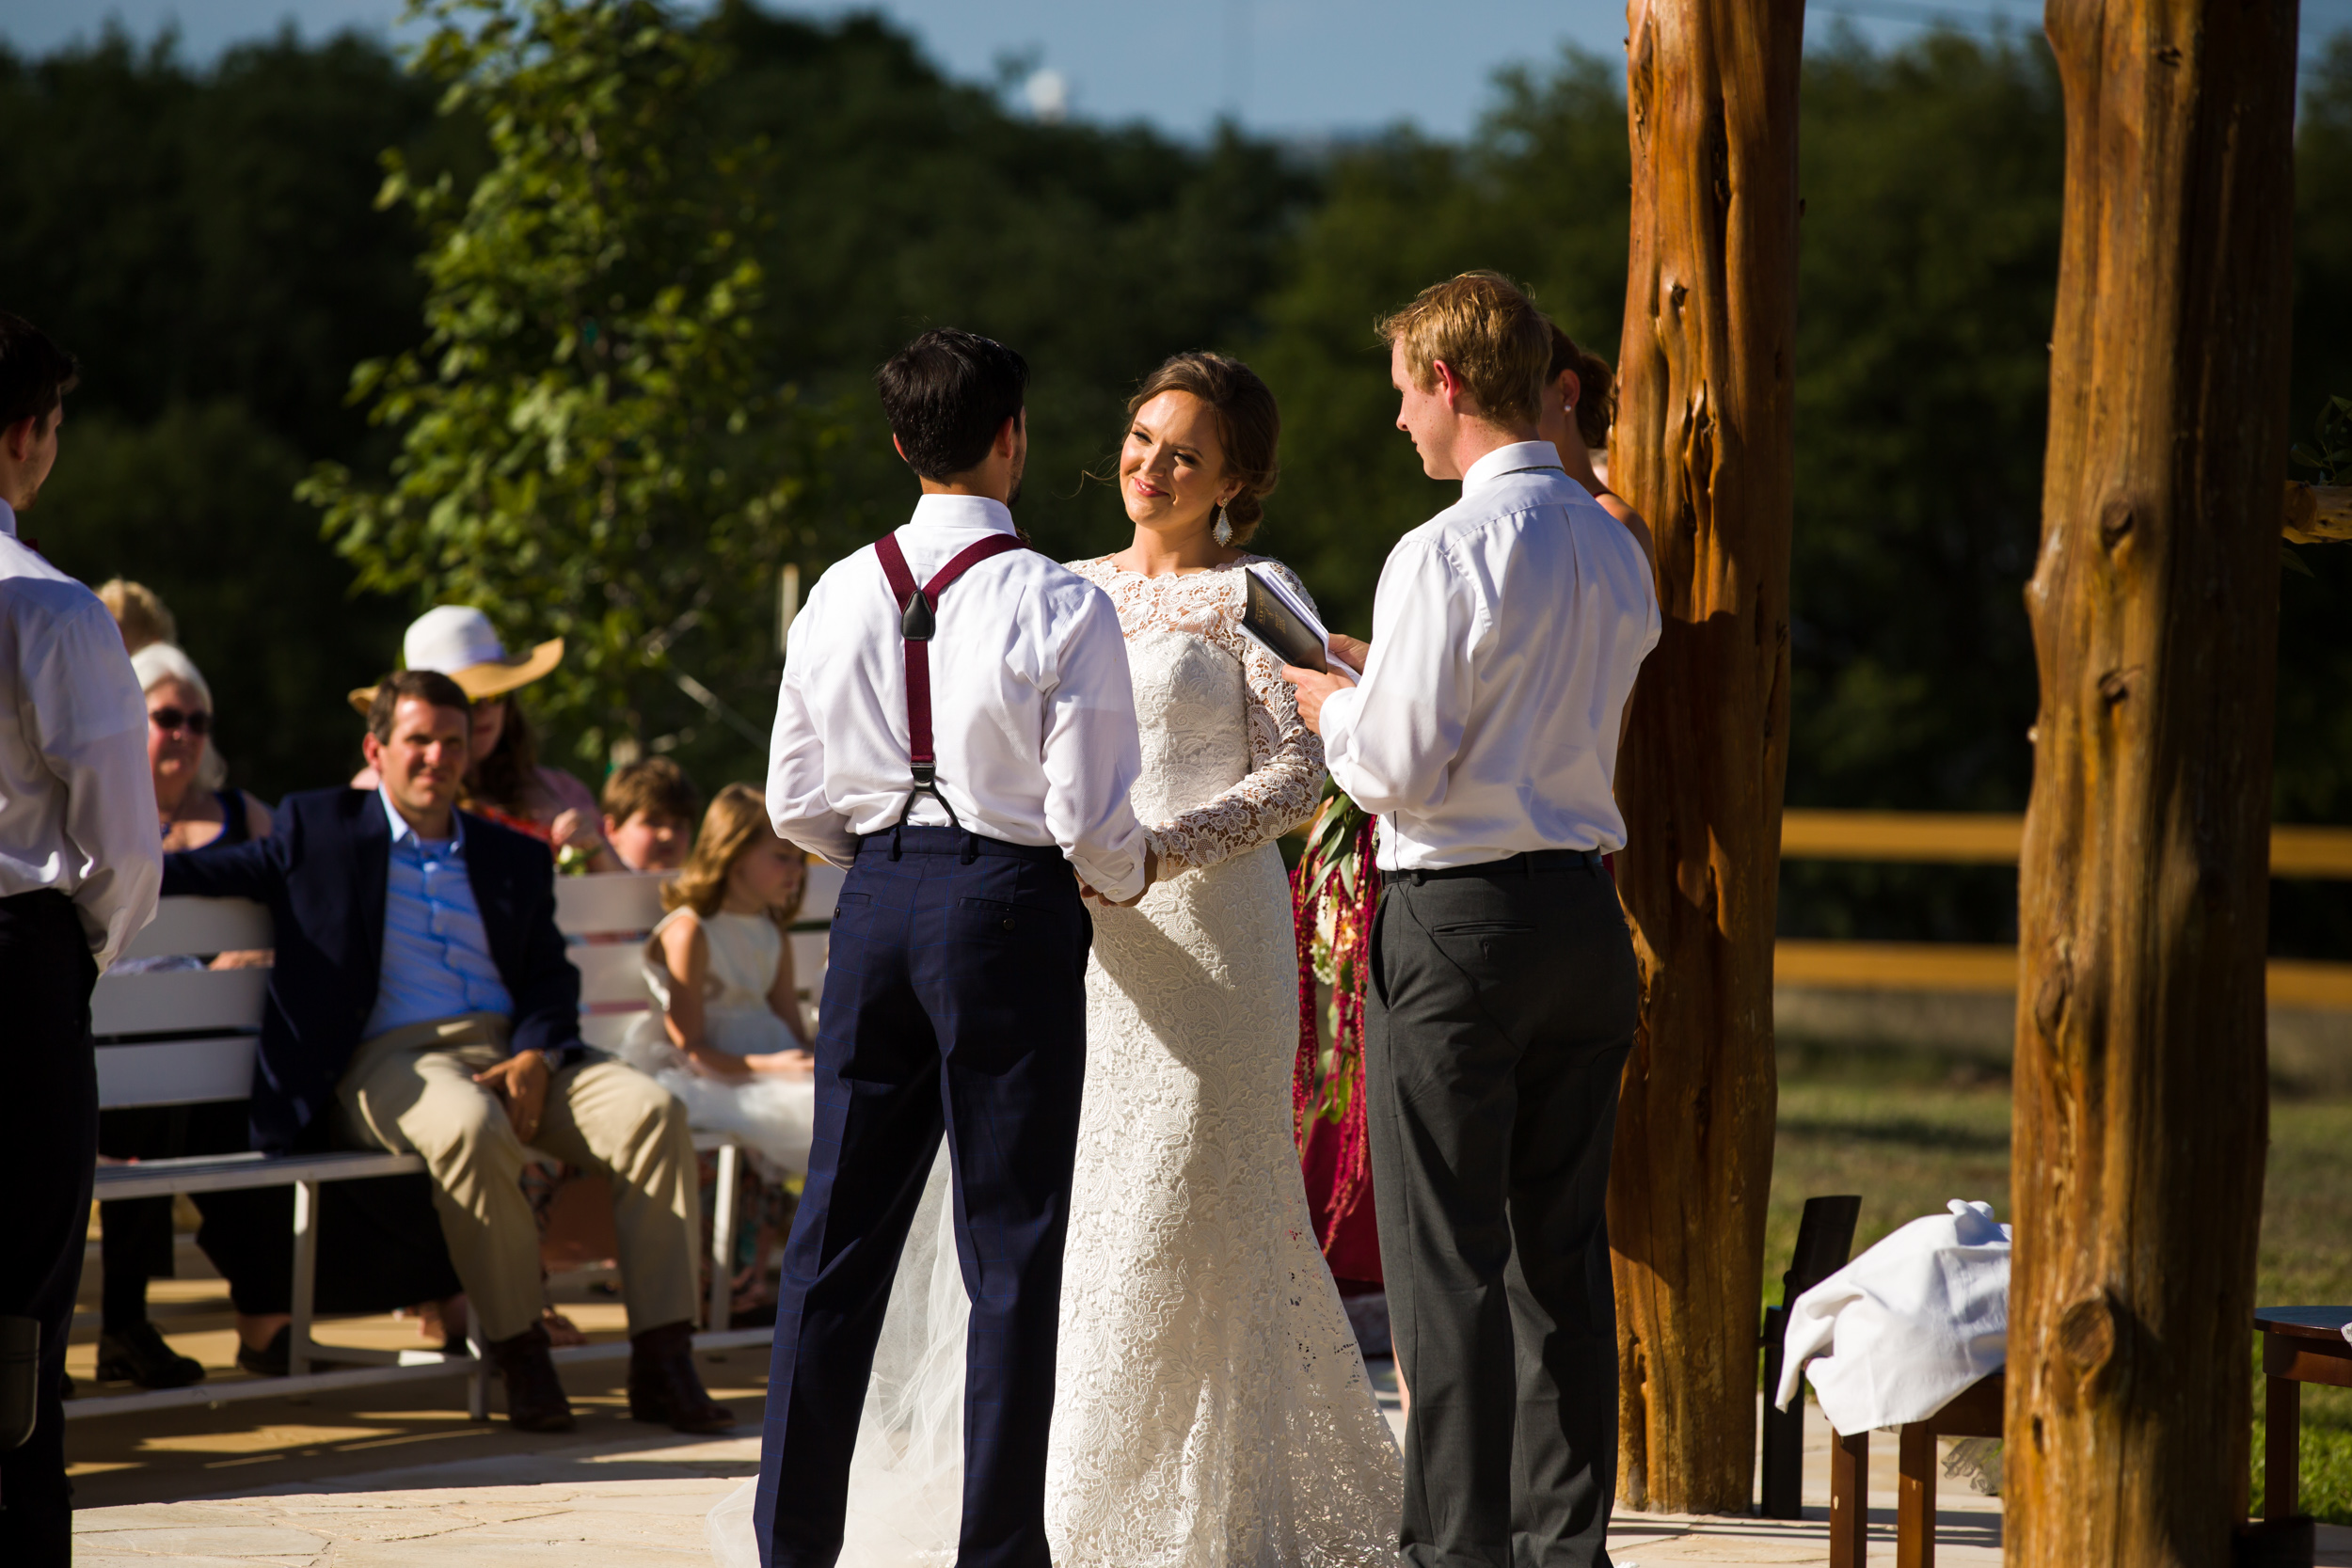 austin-wedding-colorful-26.jpg